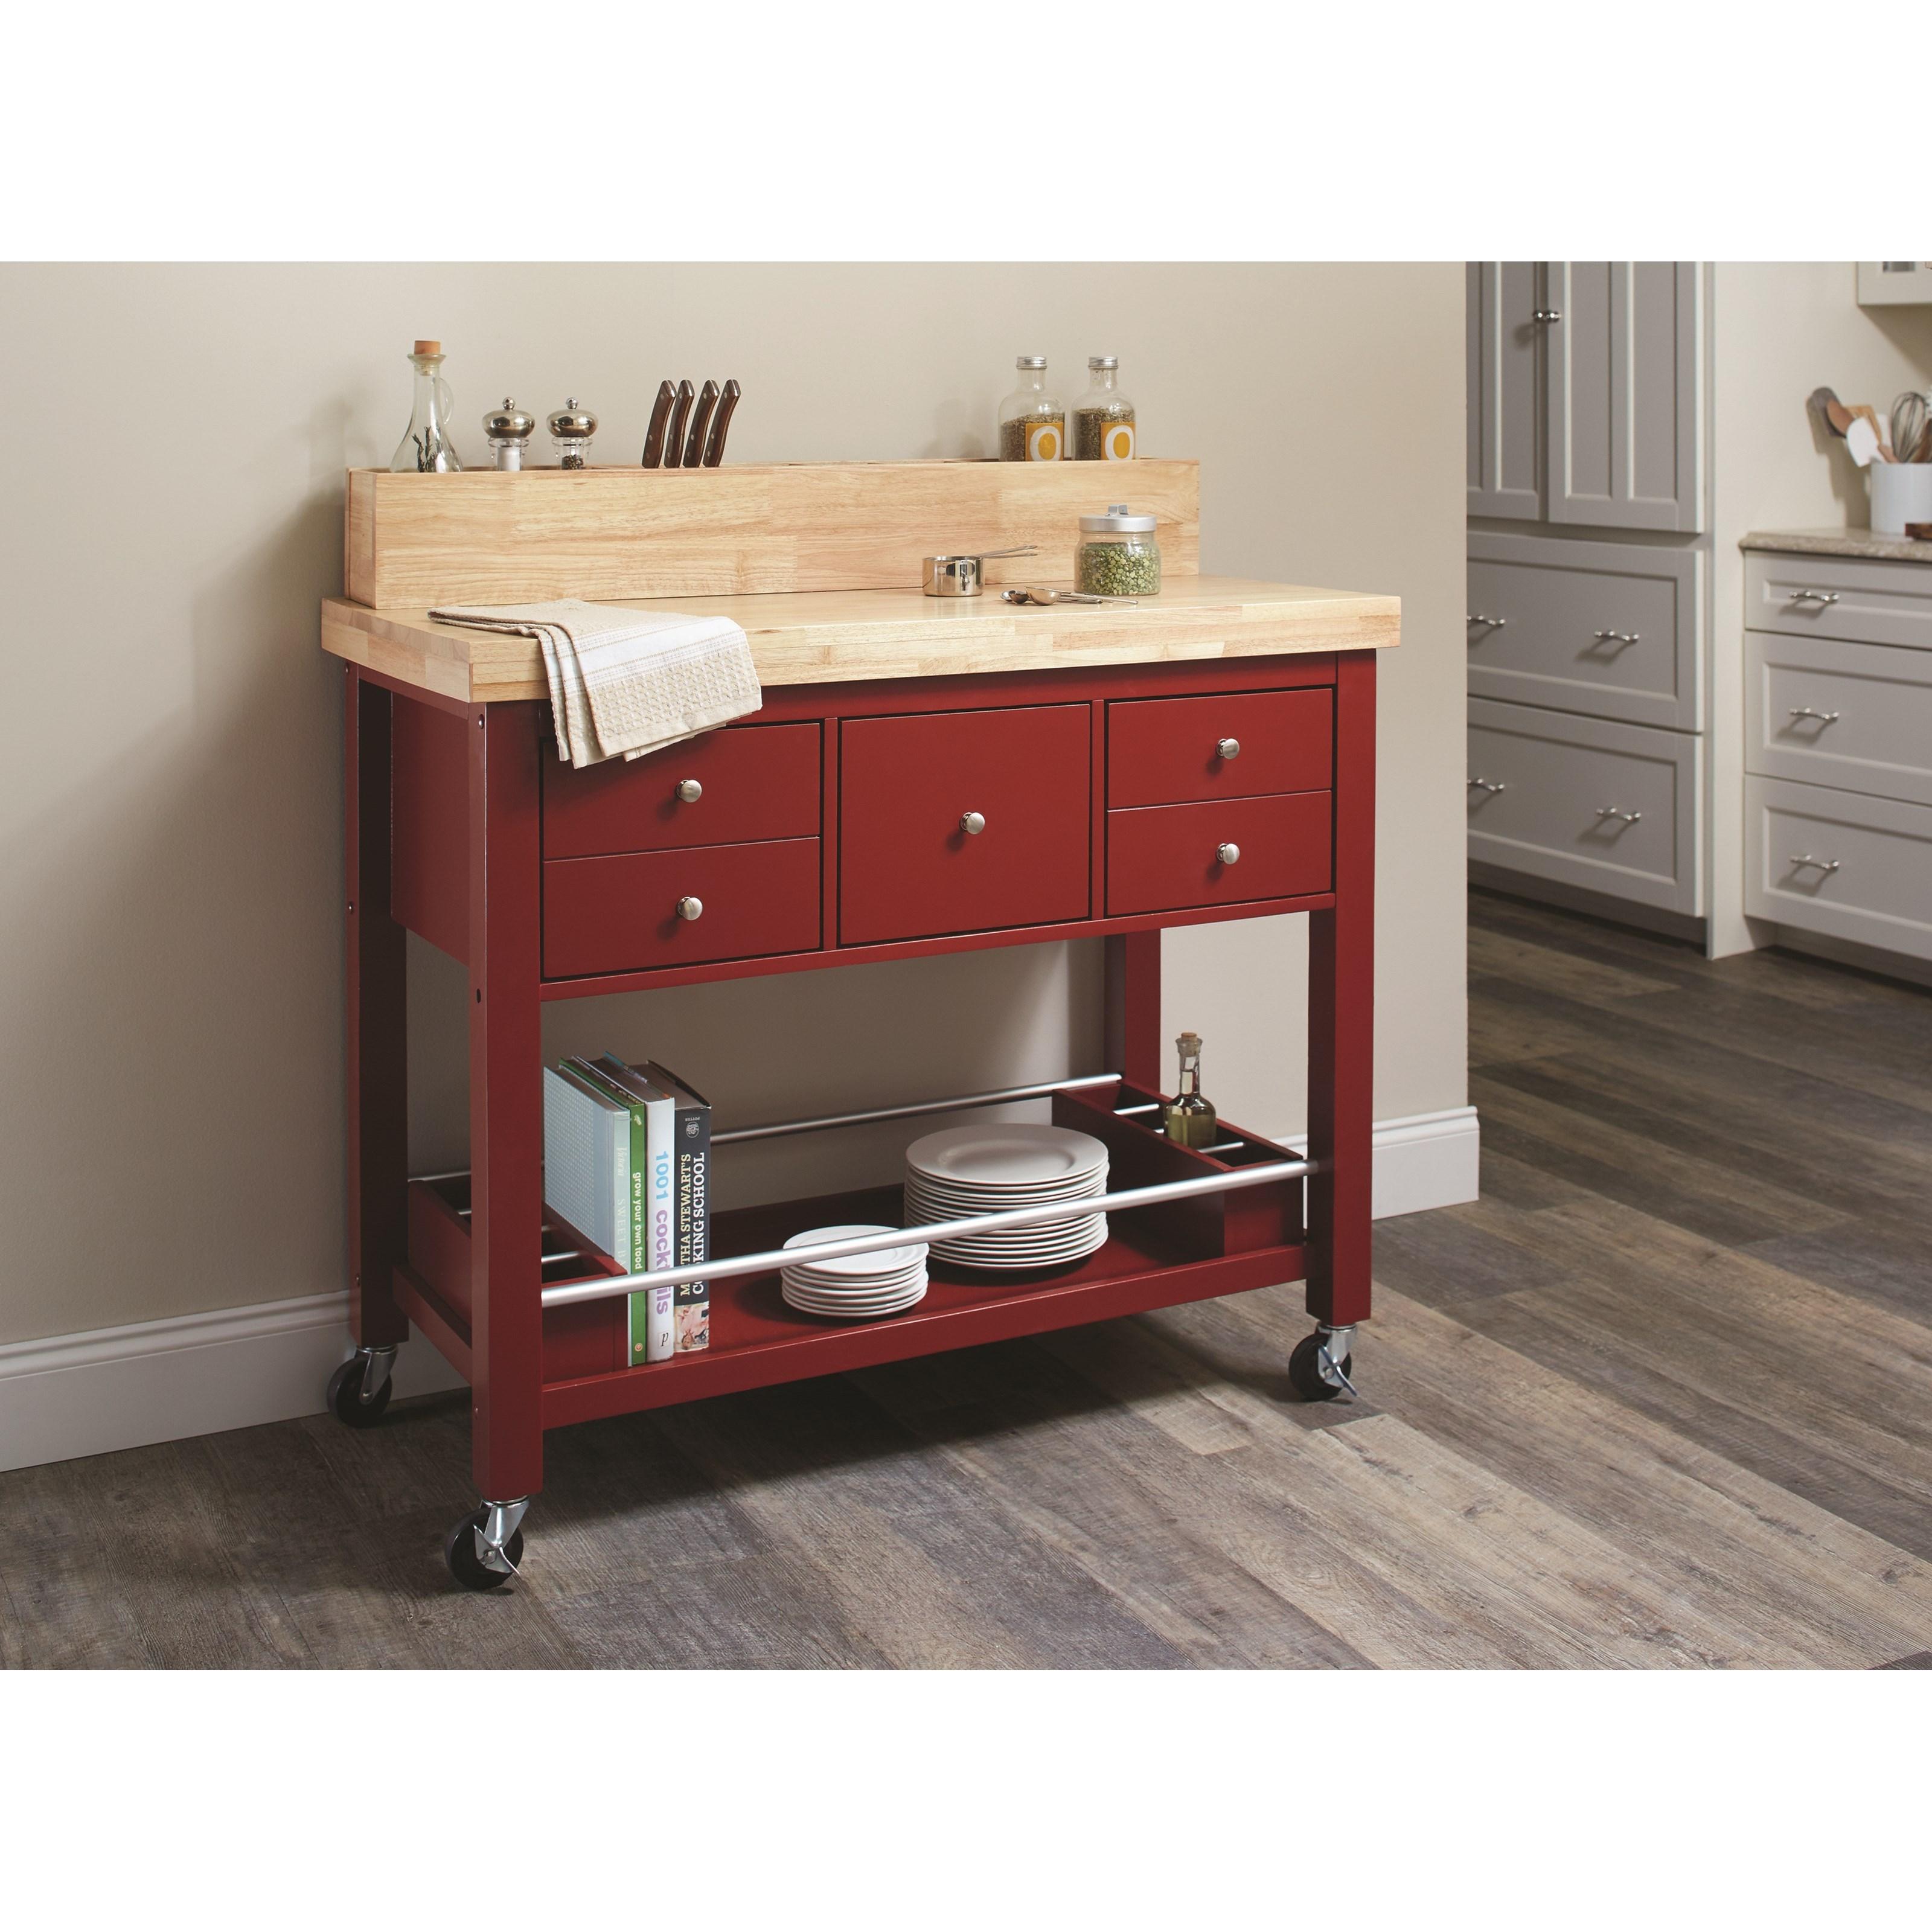 coaster kitchen carts kitchen island - item number: 102667 LZJYFMI